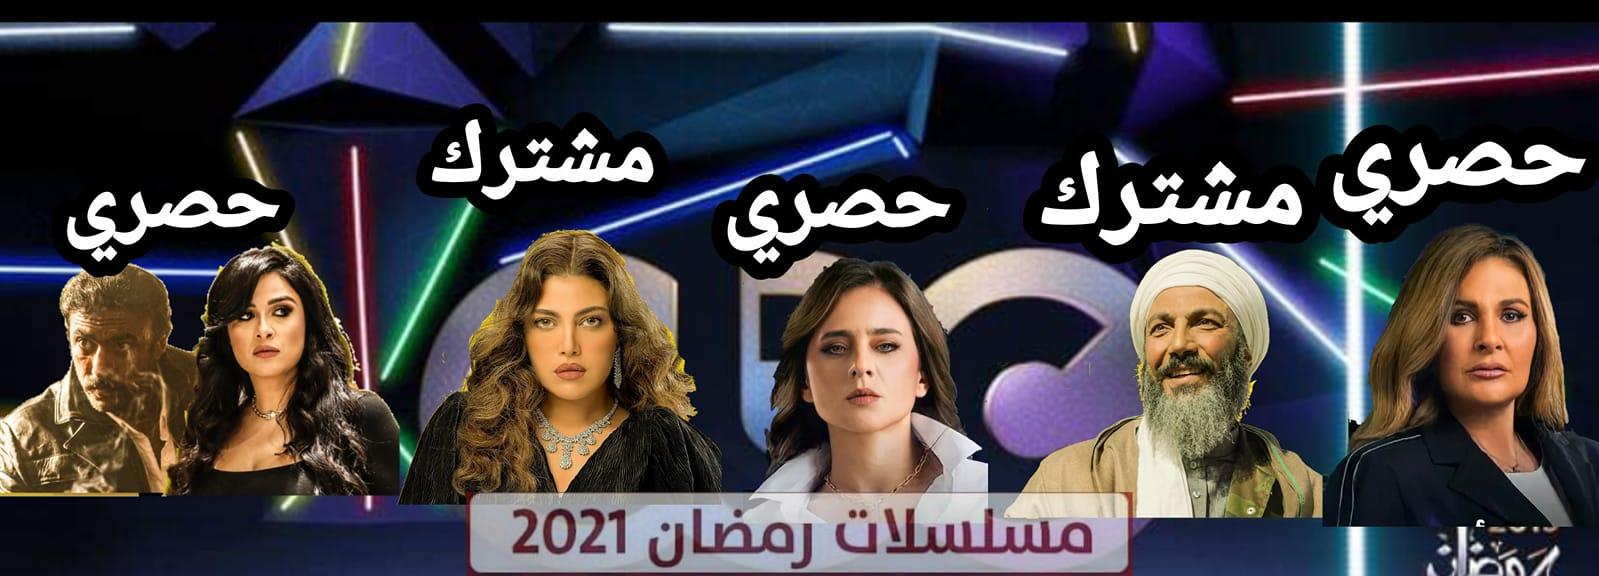 مسلسلات قناة سي بي سي 2021 في رمضان